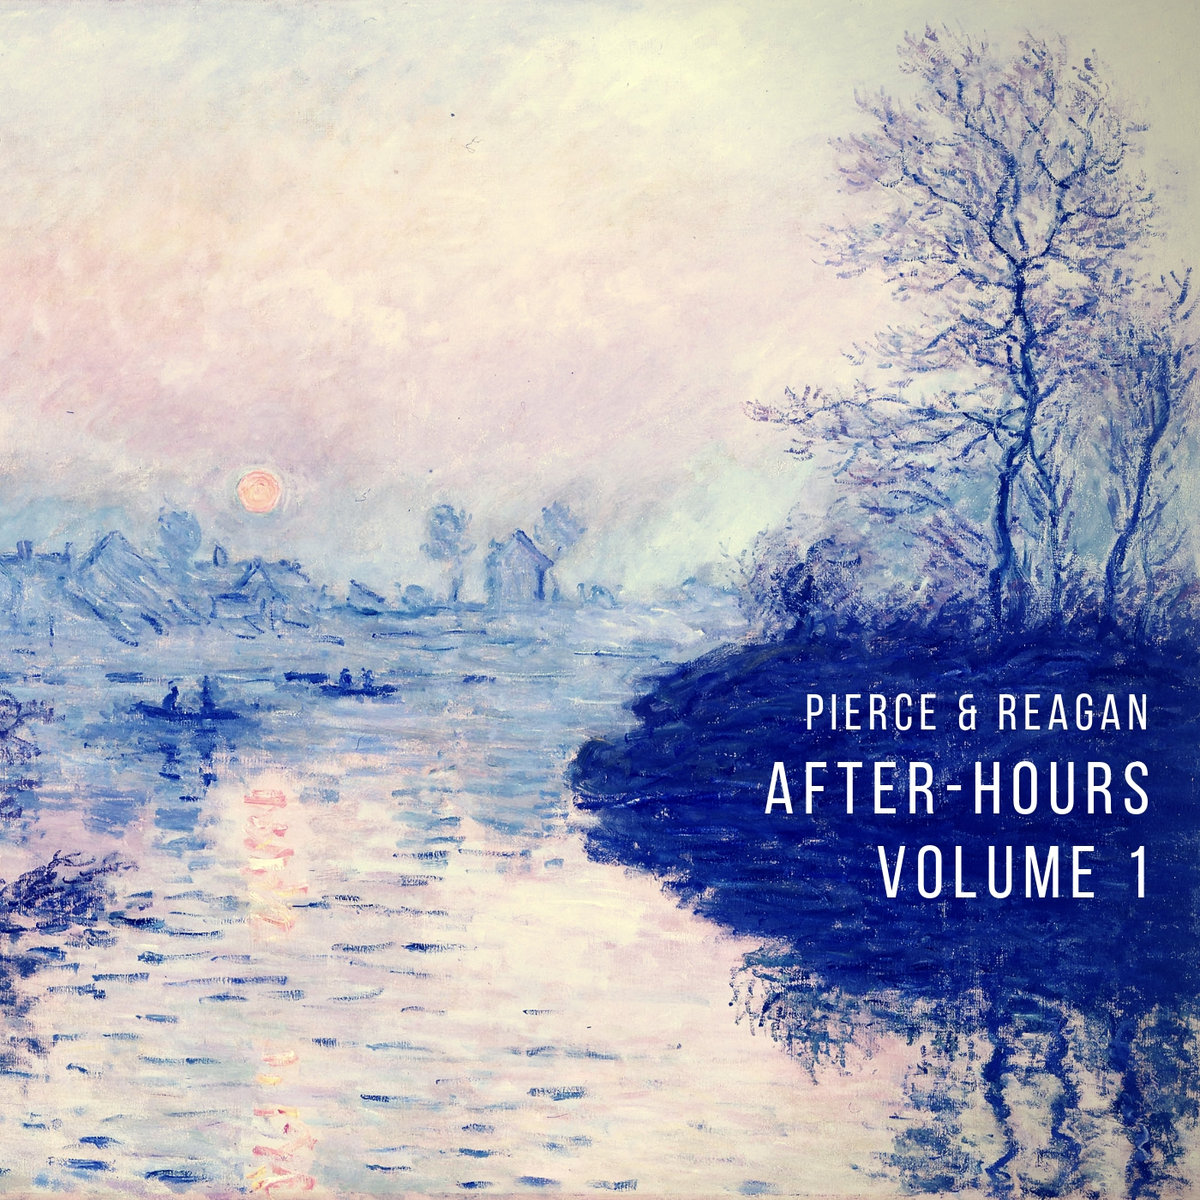 afterhours vol 1.jpg